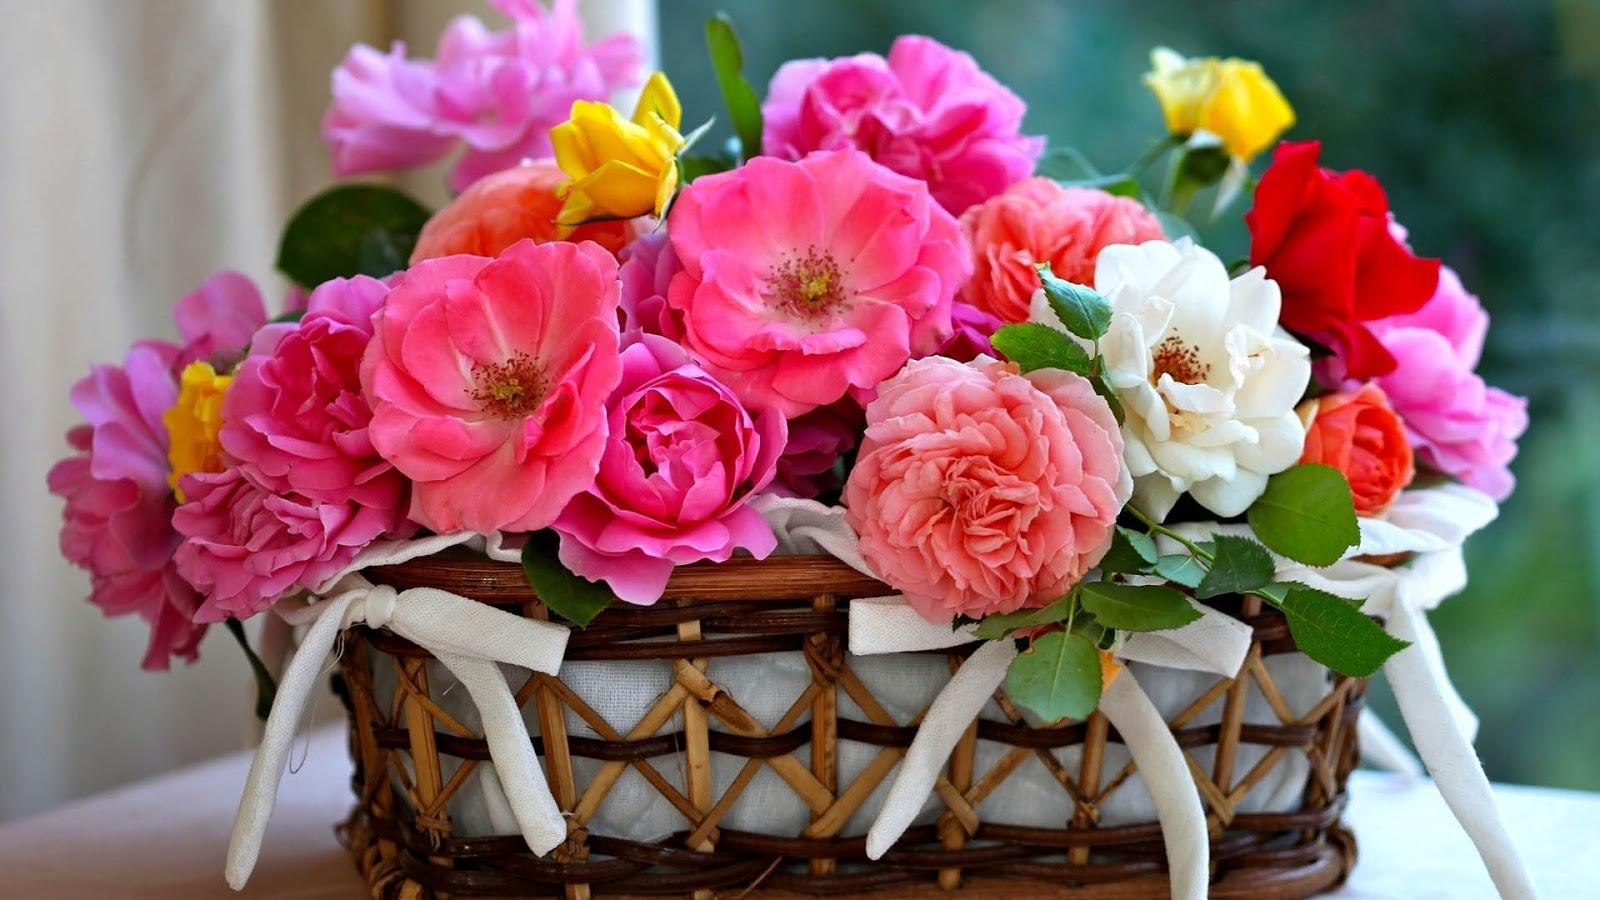 Pink flowers basket hd wallpaper free high definition wallpapers shayari urdu imagesurdu shayari with pictureurdu shayari description beautiful flowers basket hd izmirmasajfo